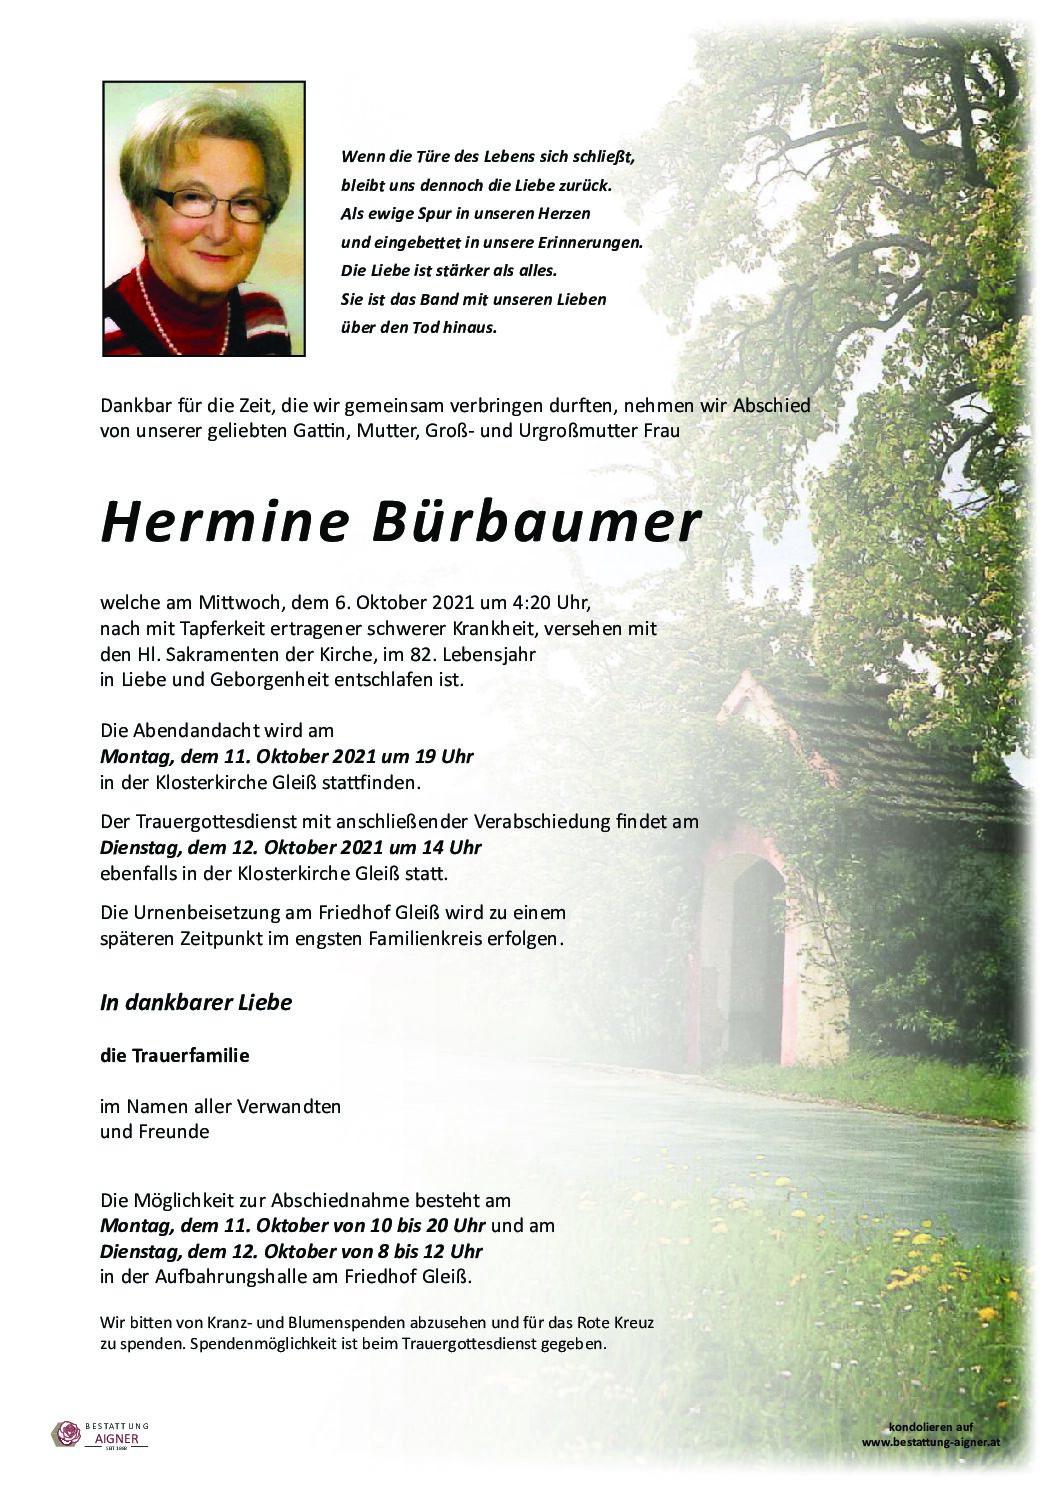 Hermine Bürbaumer